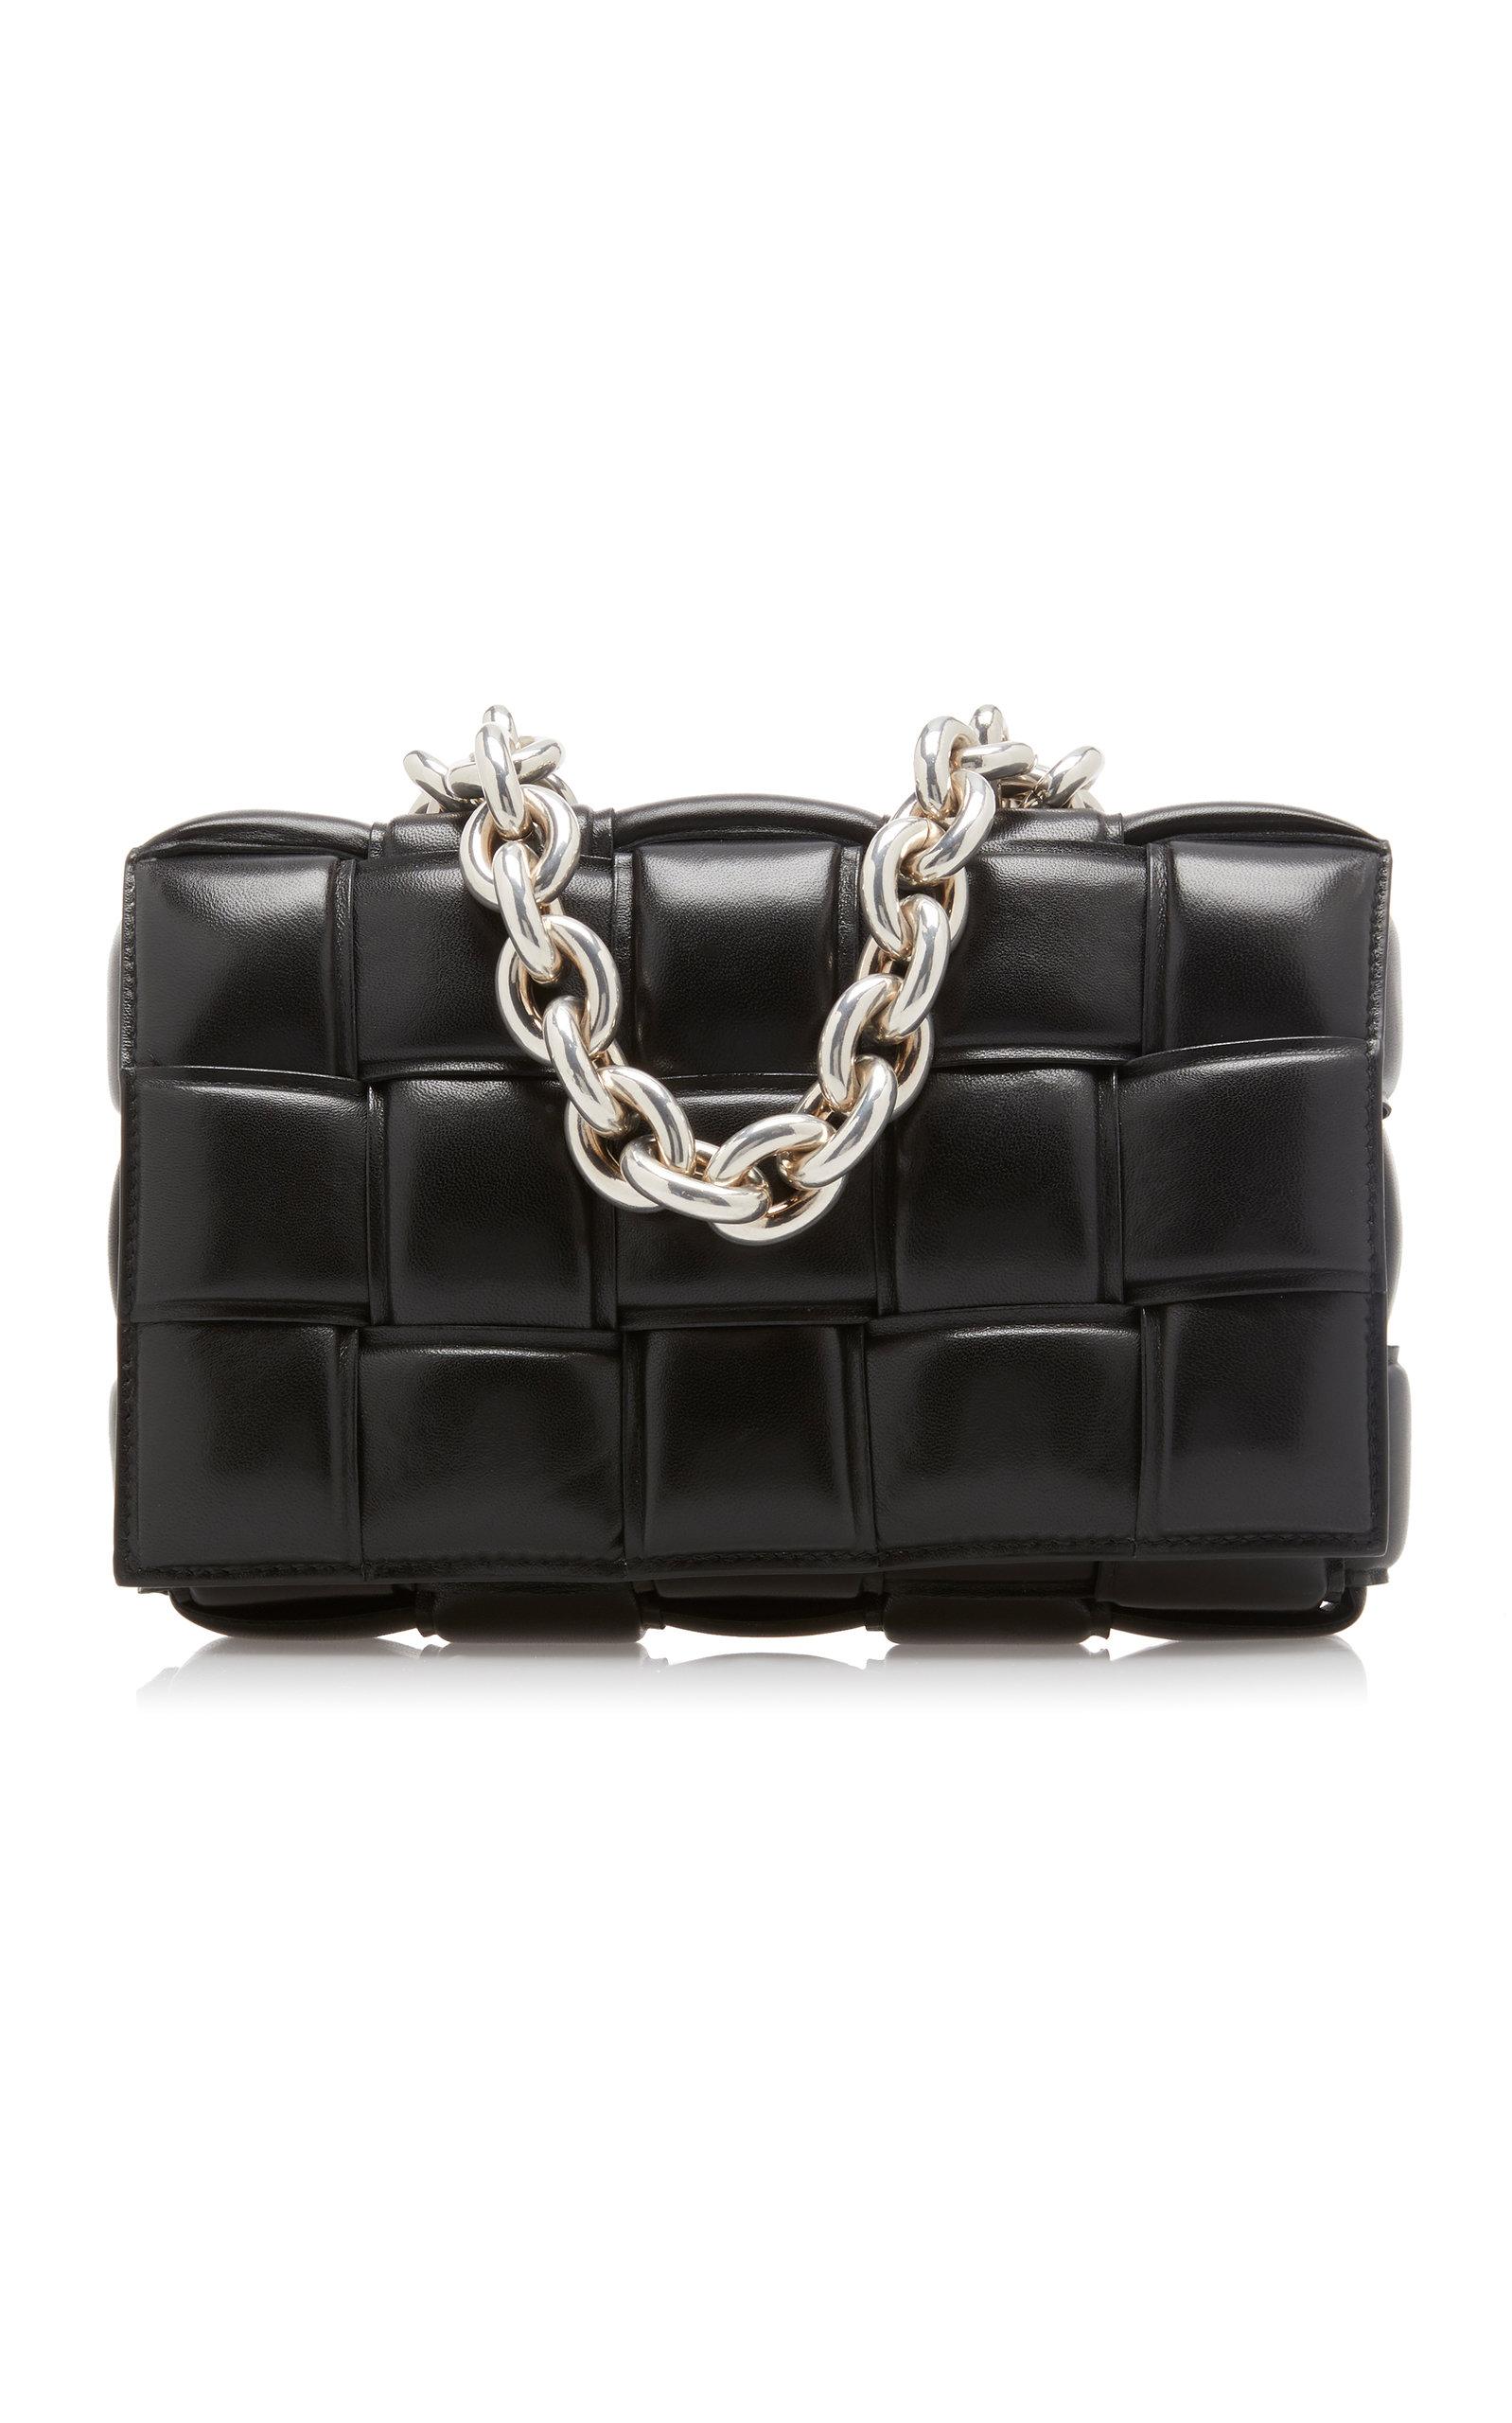 Woven using Bottega Veneta's distinguished intrecciato technique, this minimal crossbody bag is cons